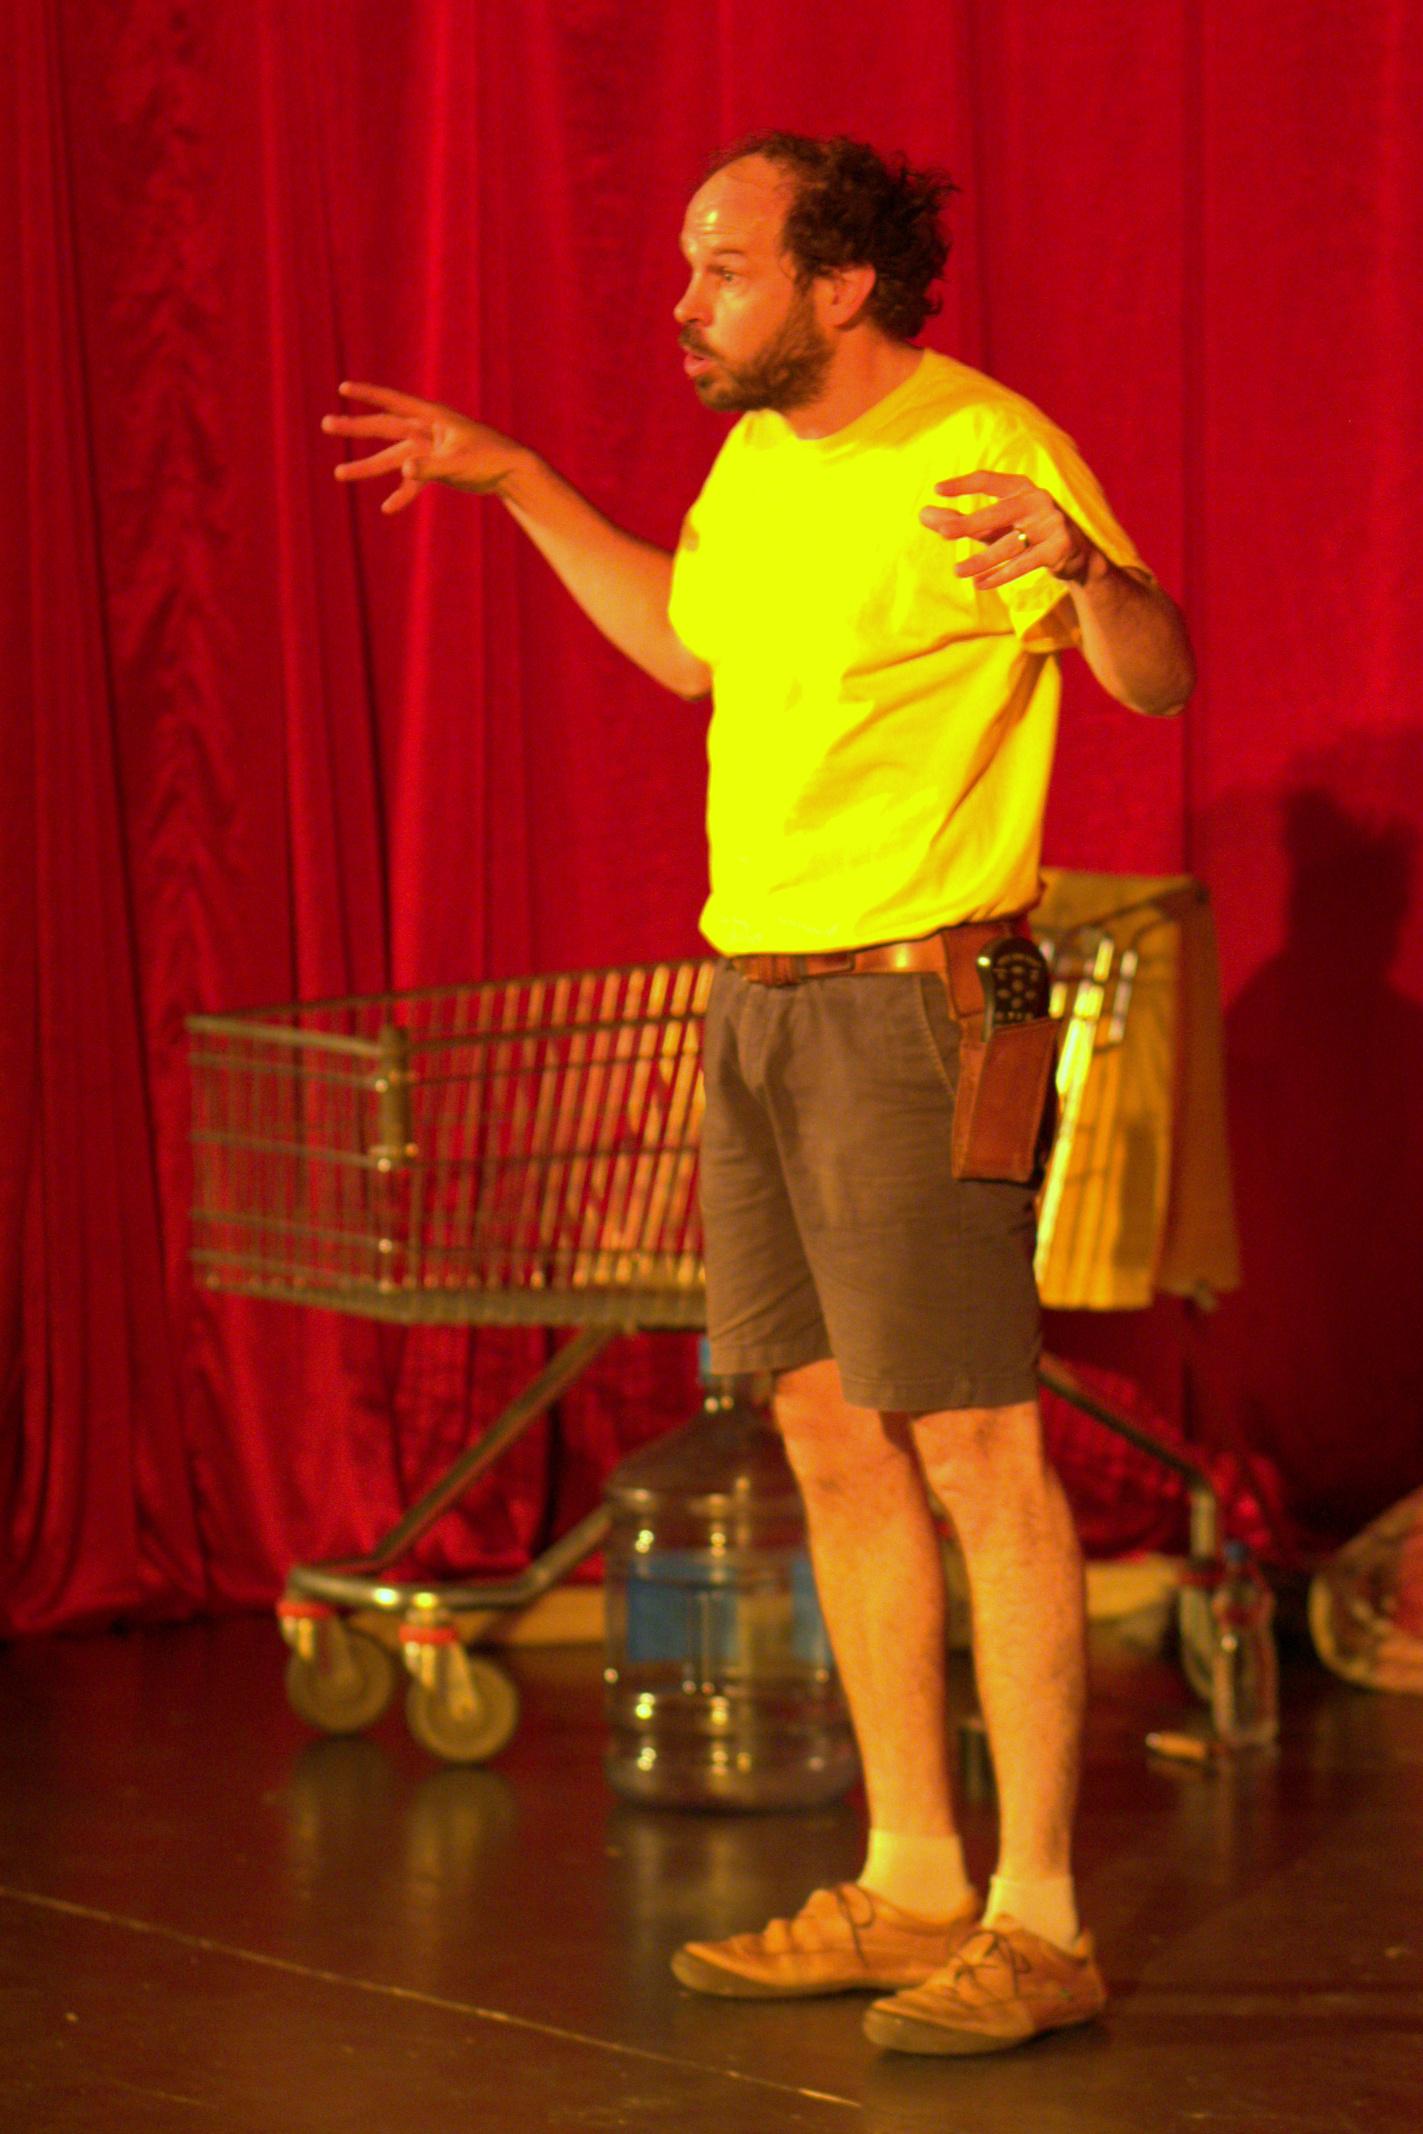 Caveman One Man Show : Caveman fotogalerie